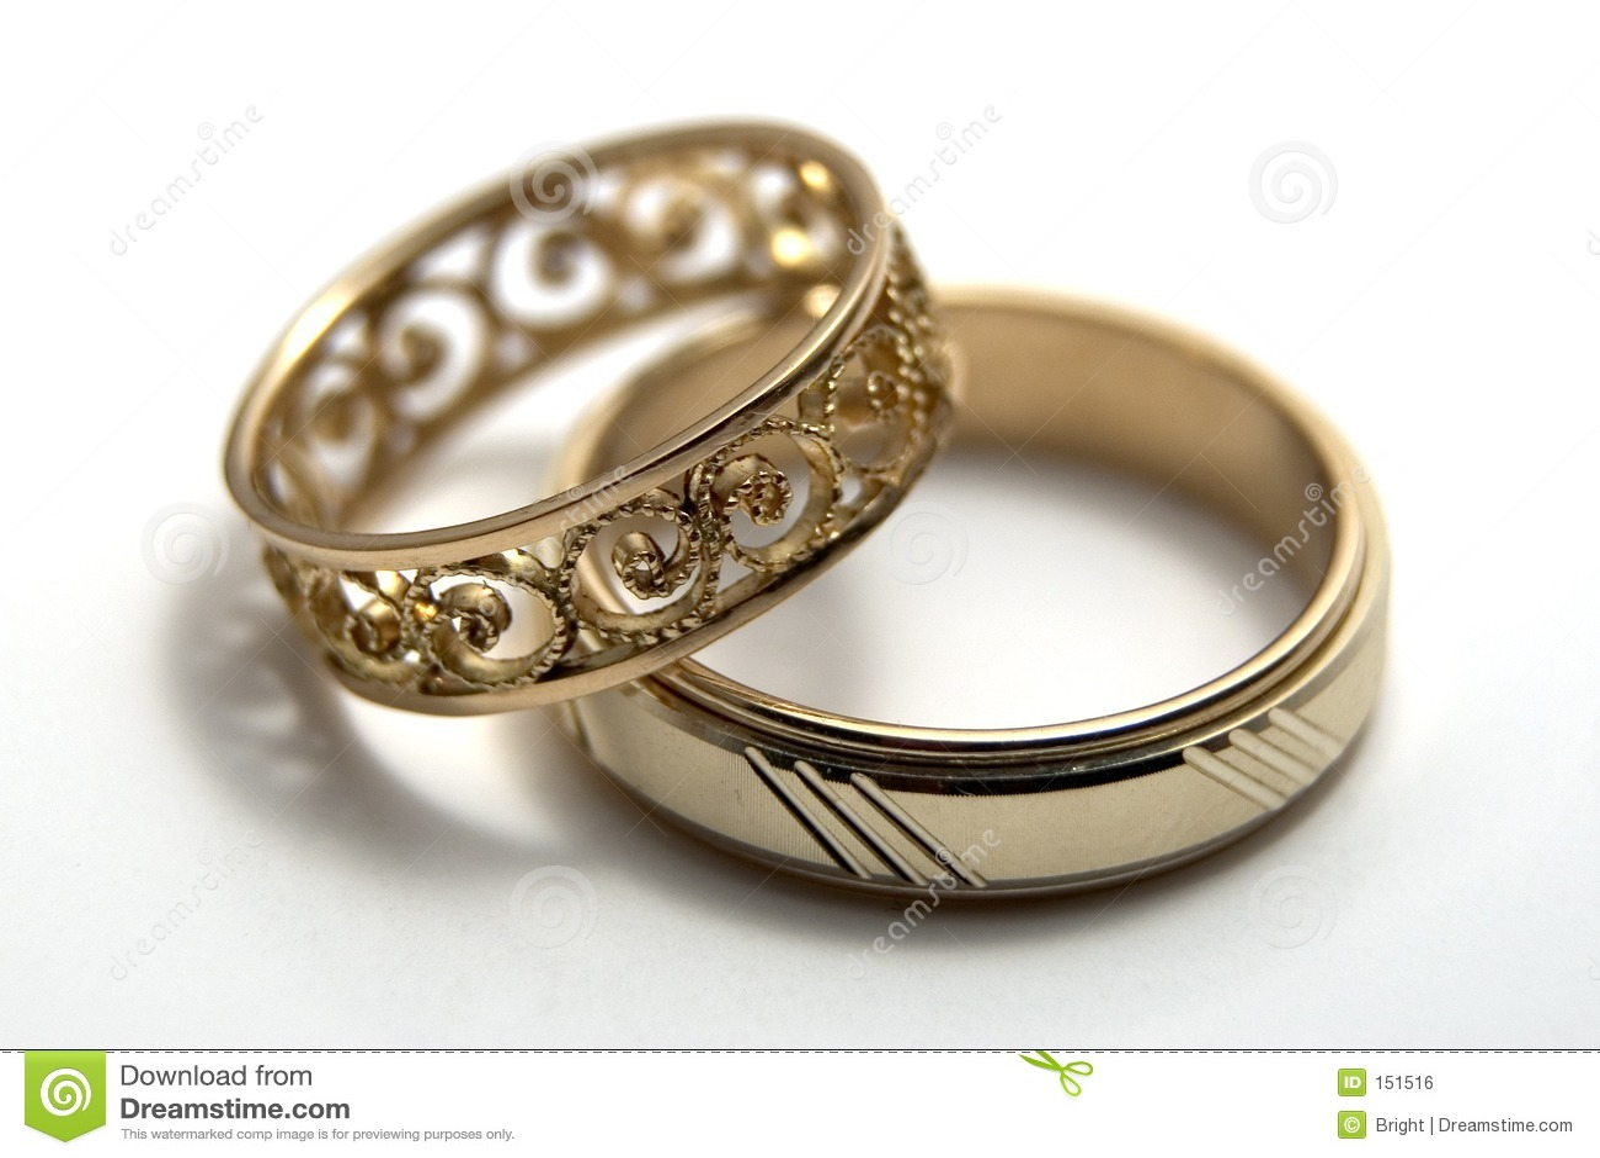 wedding rings pictures of wedding rings Wedding rings Royalty Free Stock Image